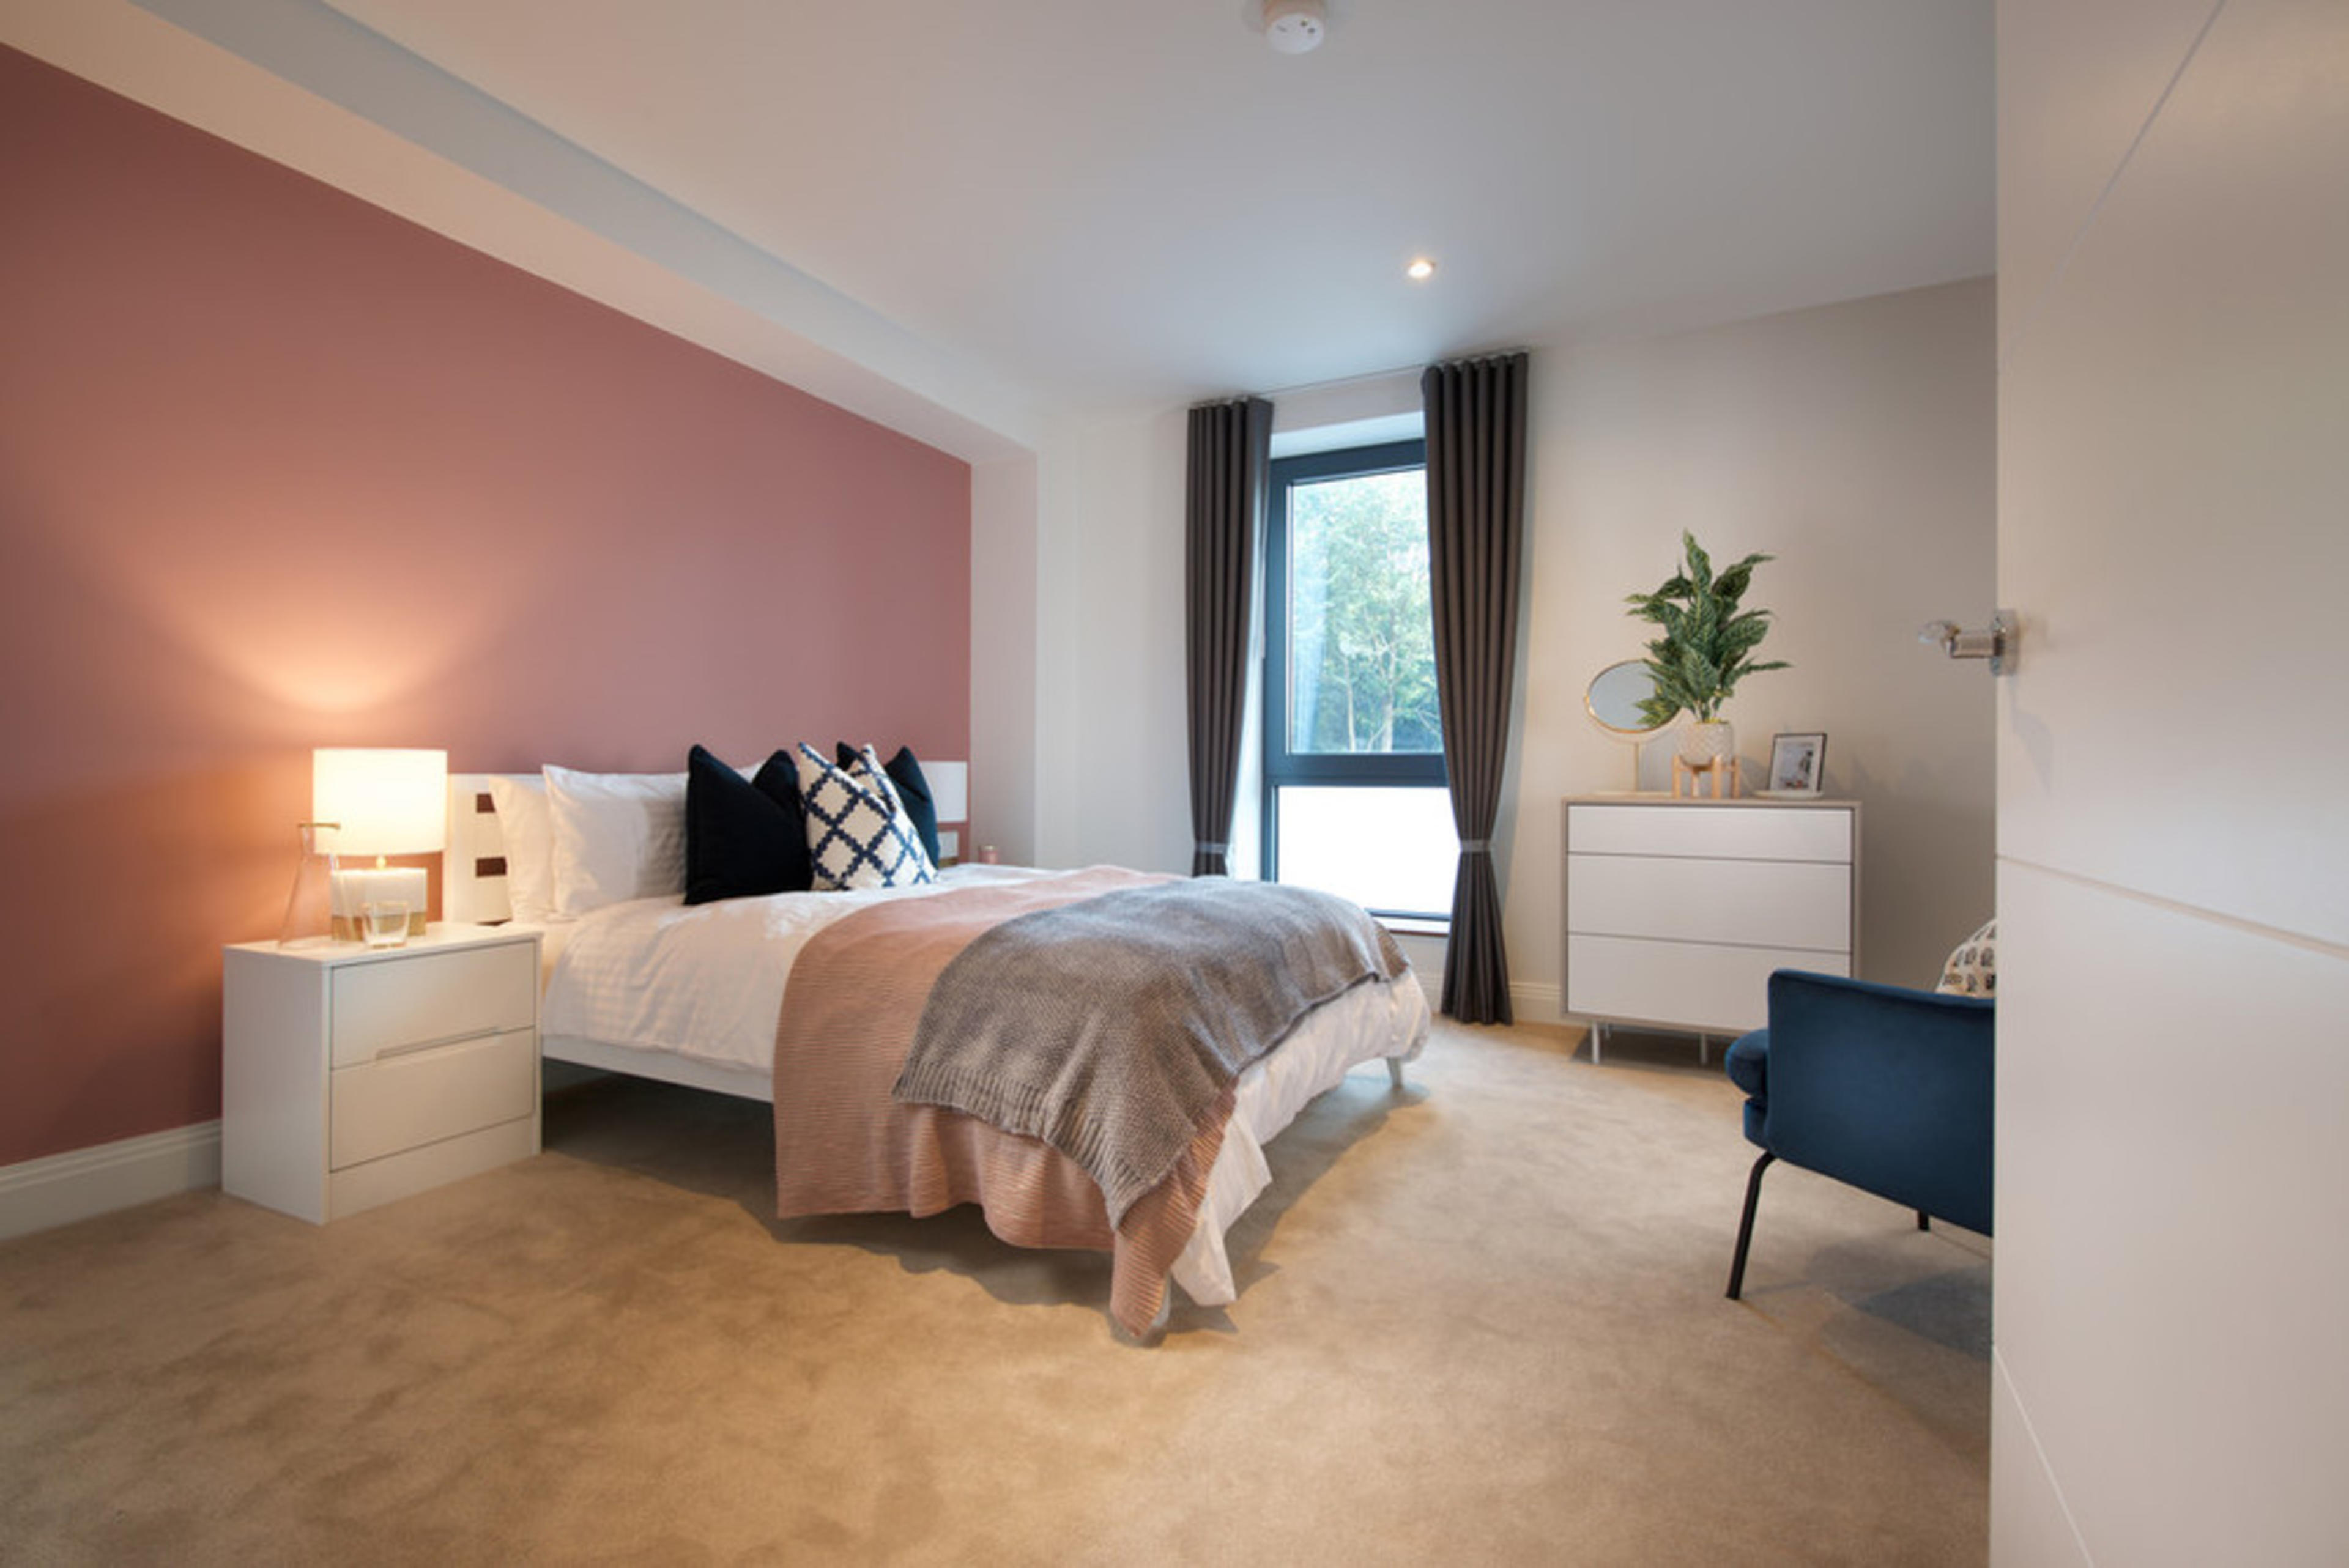 Union Park - Bedroom 2